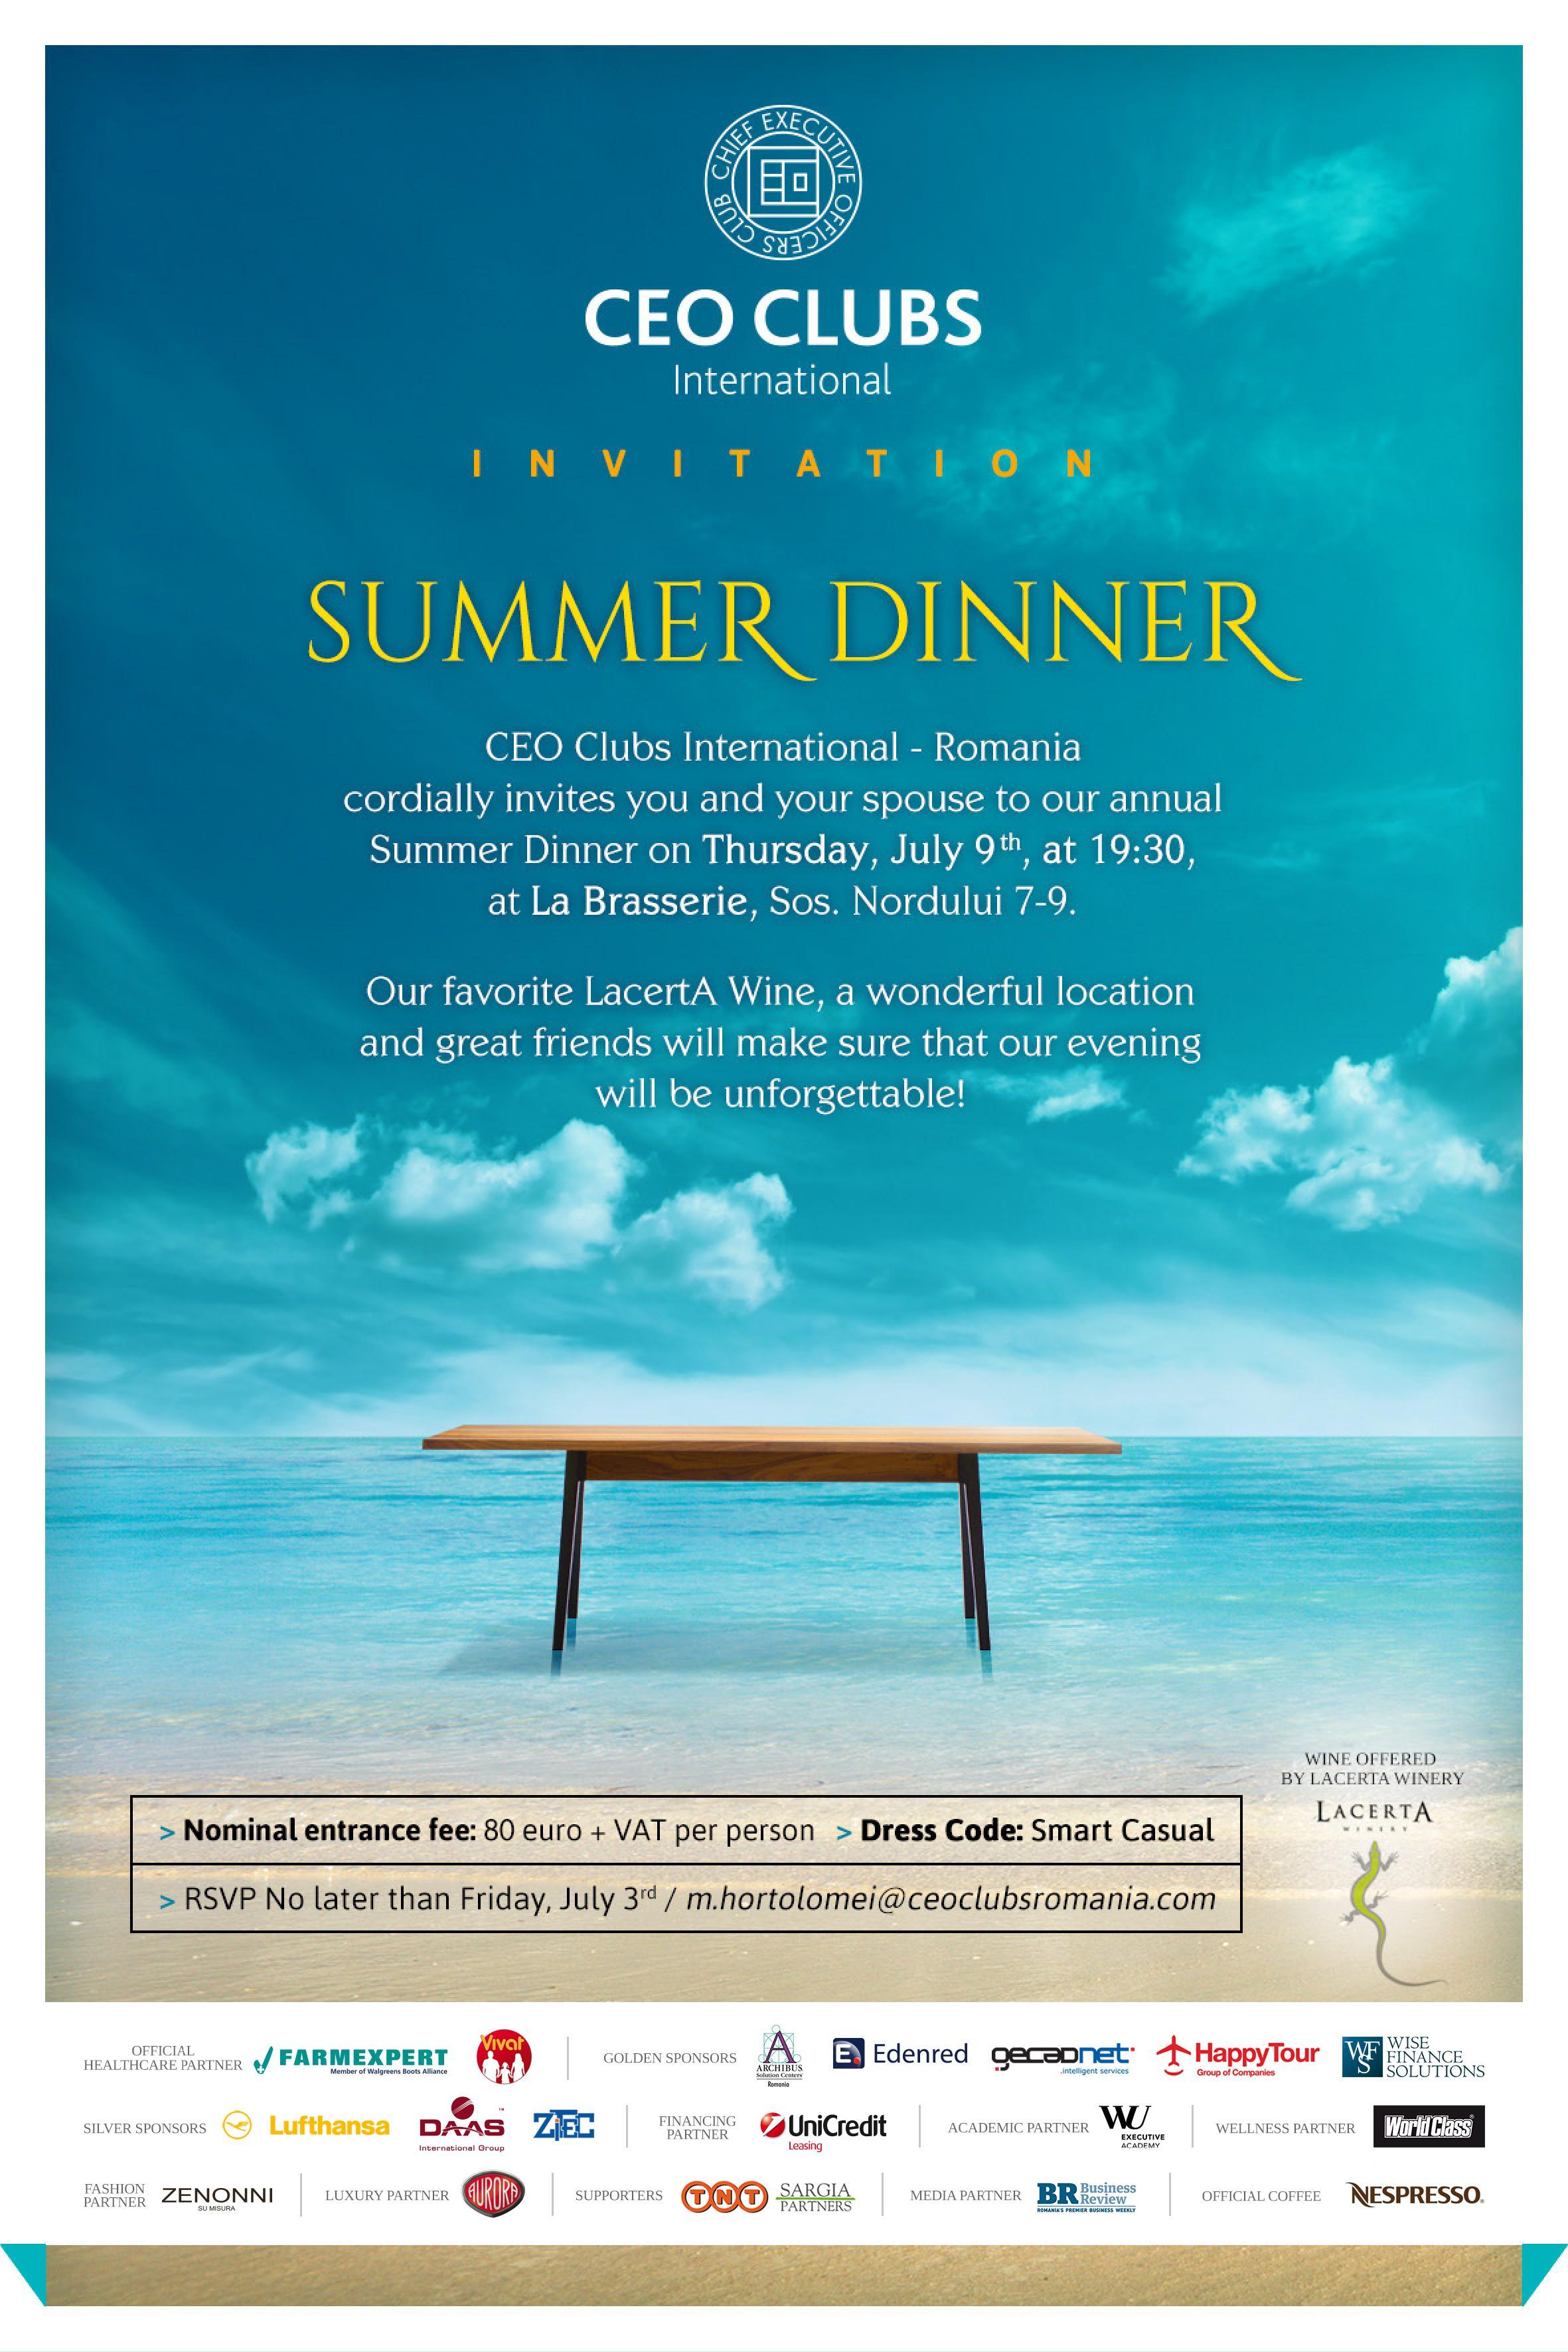 Summer Dinner 2015